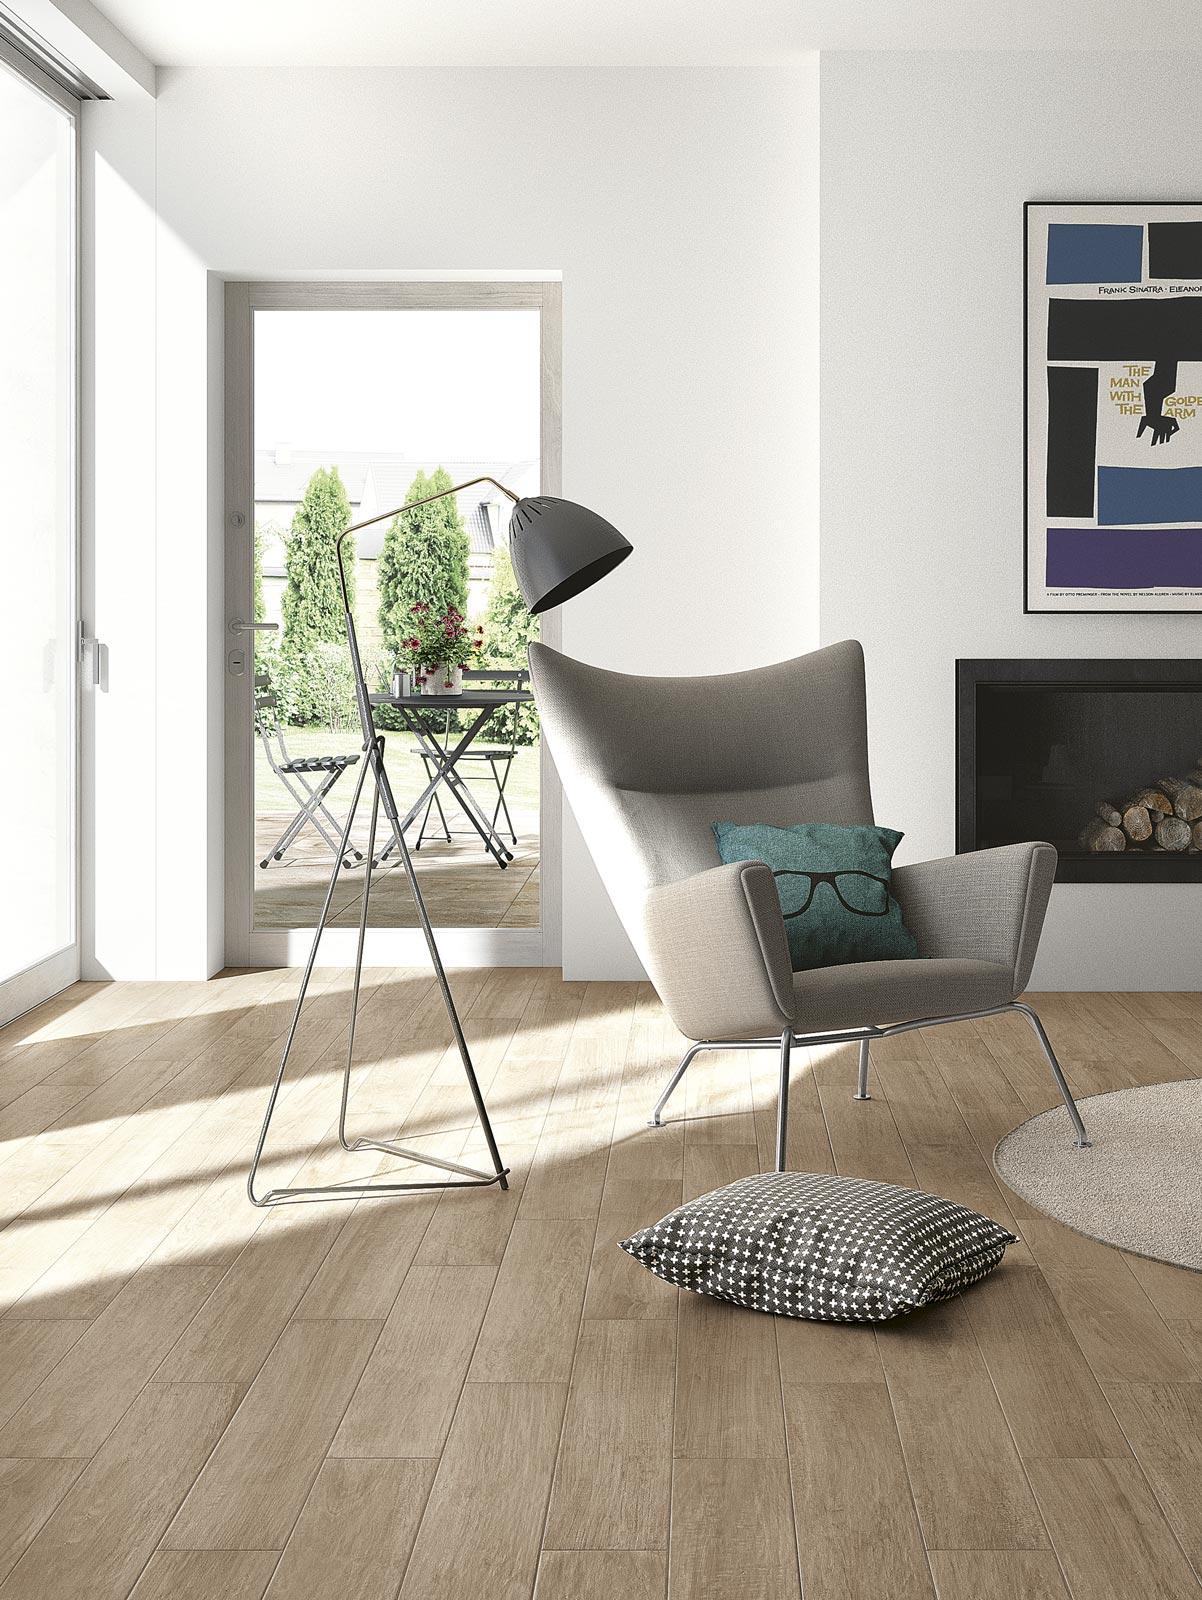 Woodcomfort Collection: wood-look stoneware floor tiles | Ragno